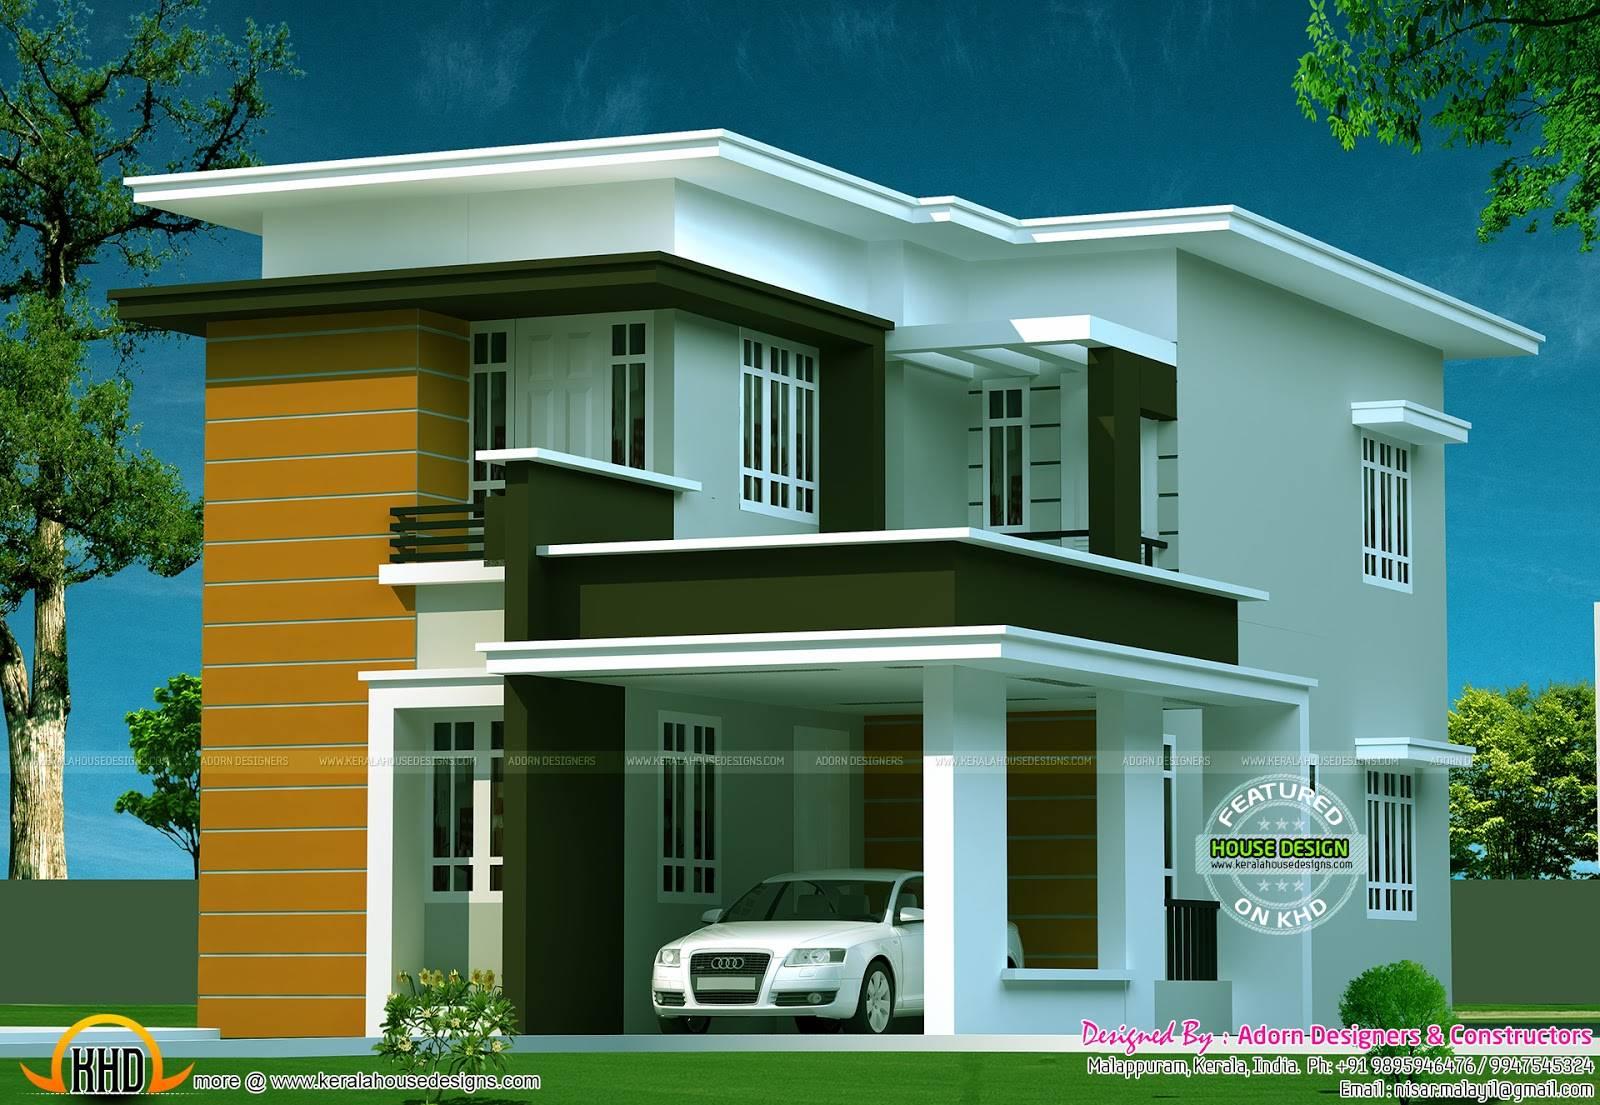 New Flat Roof House Kerala Home Design Floor Plans House Plans 95363